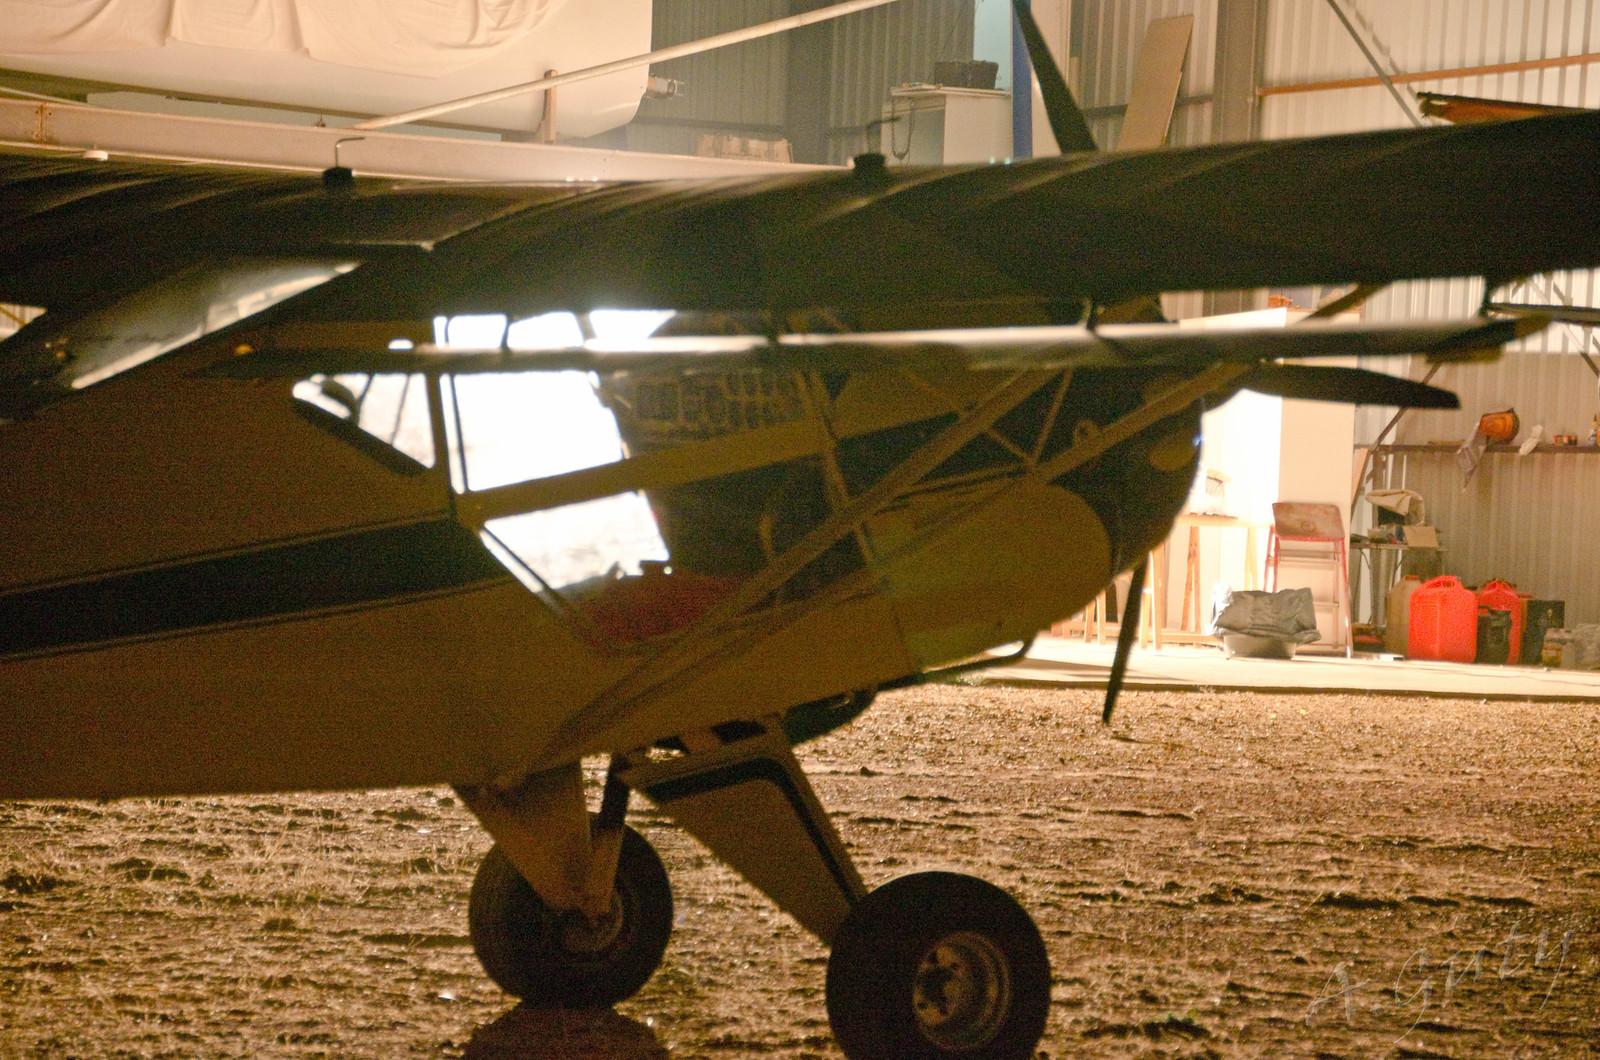 Cena Club Aerodromo Astorga Kitfox  hangar noche (58)